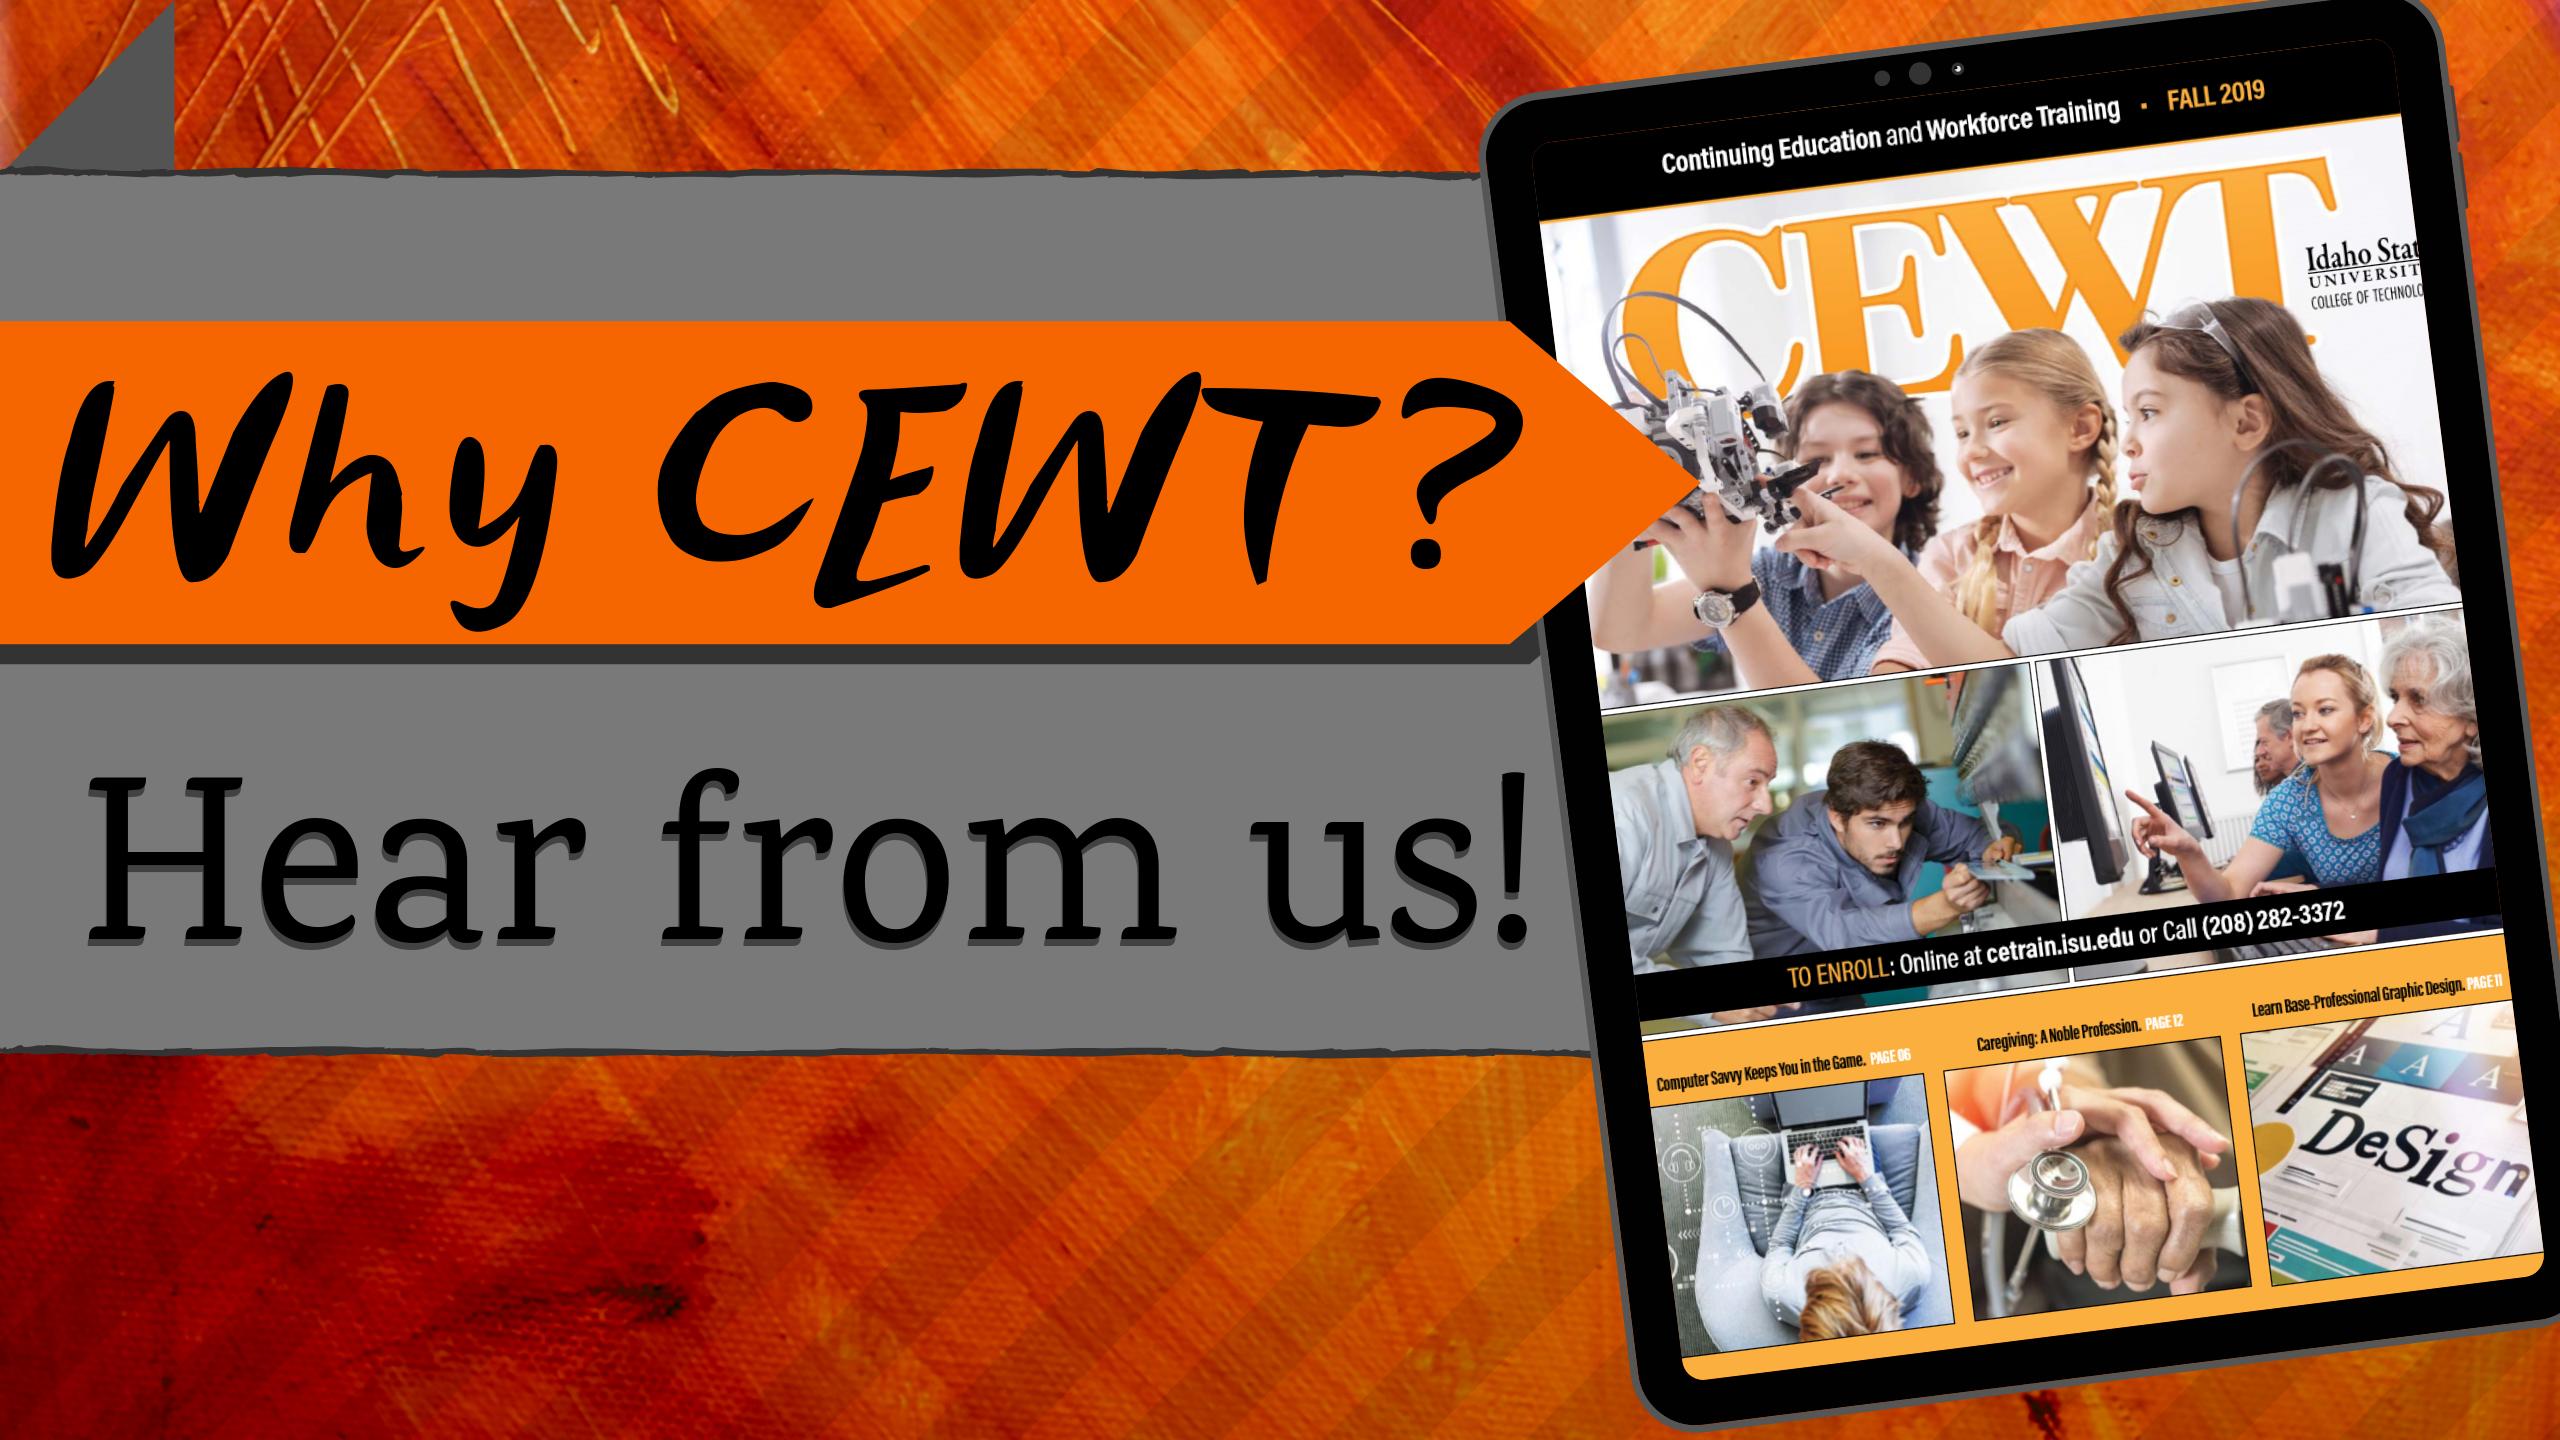 Why CEWT